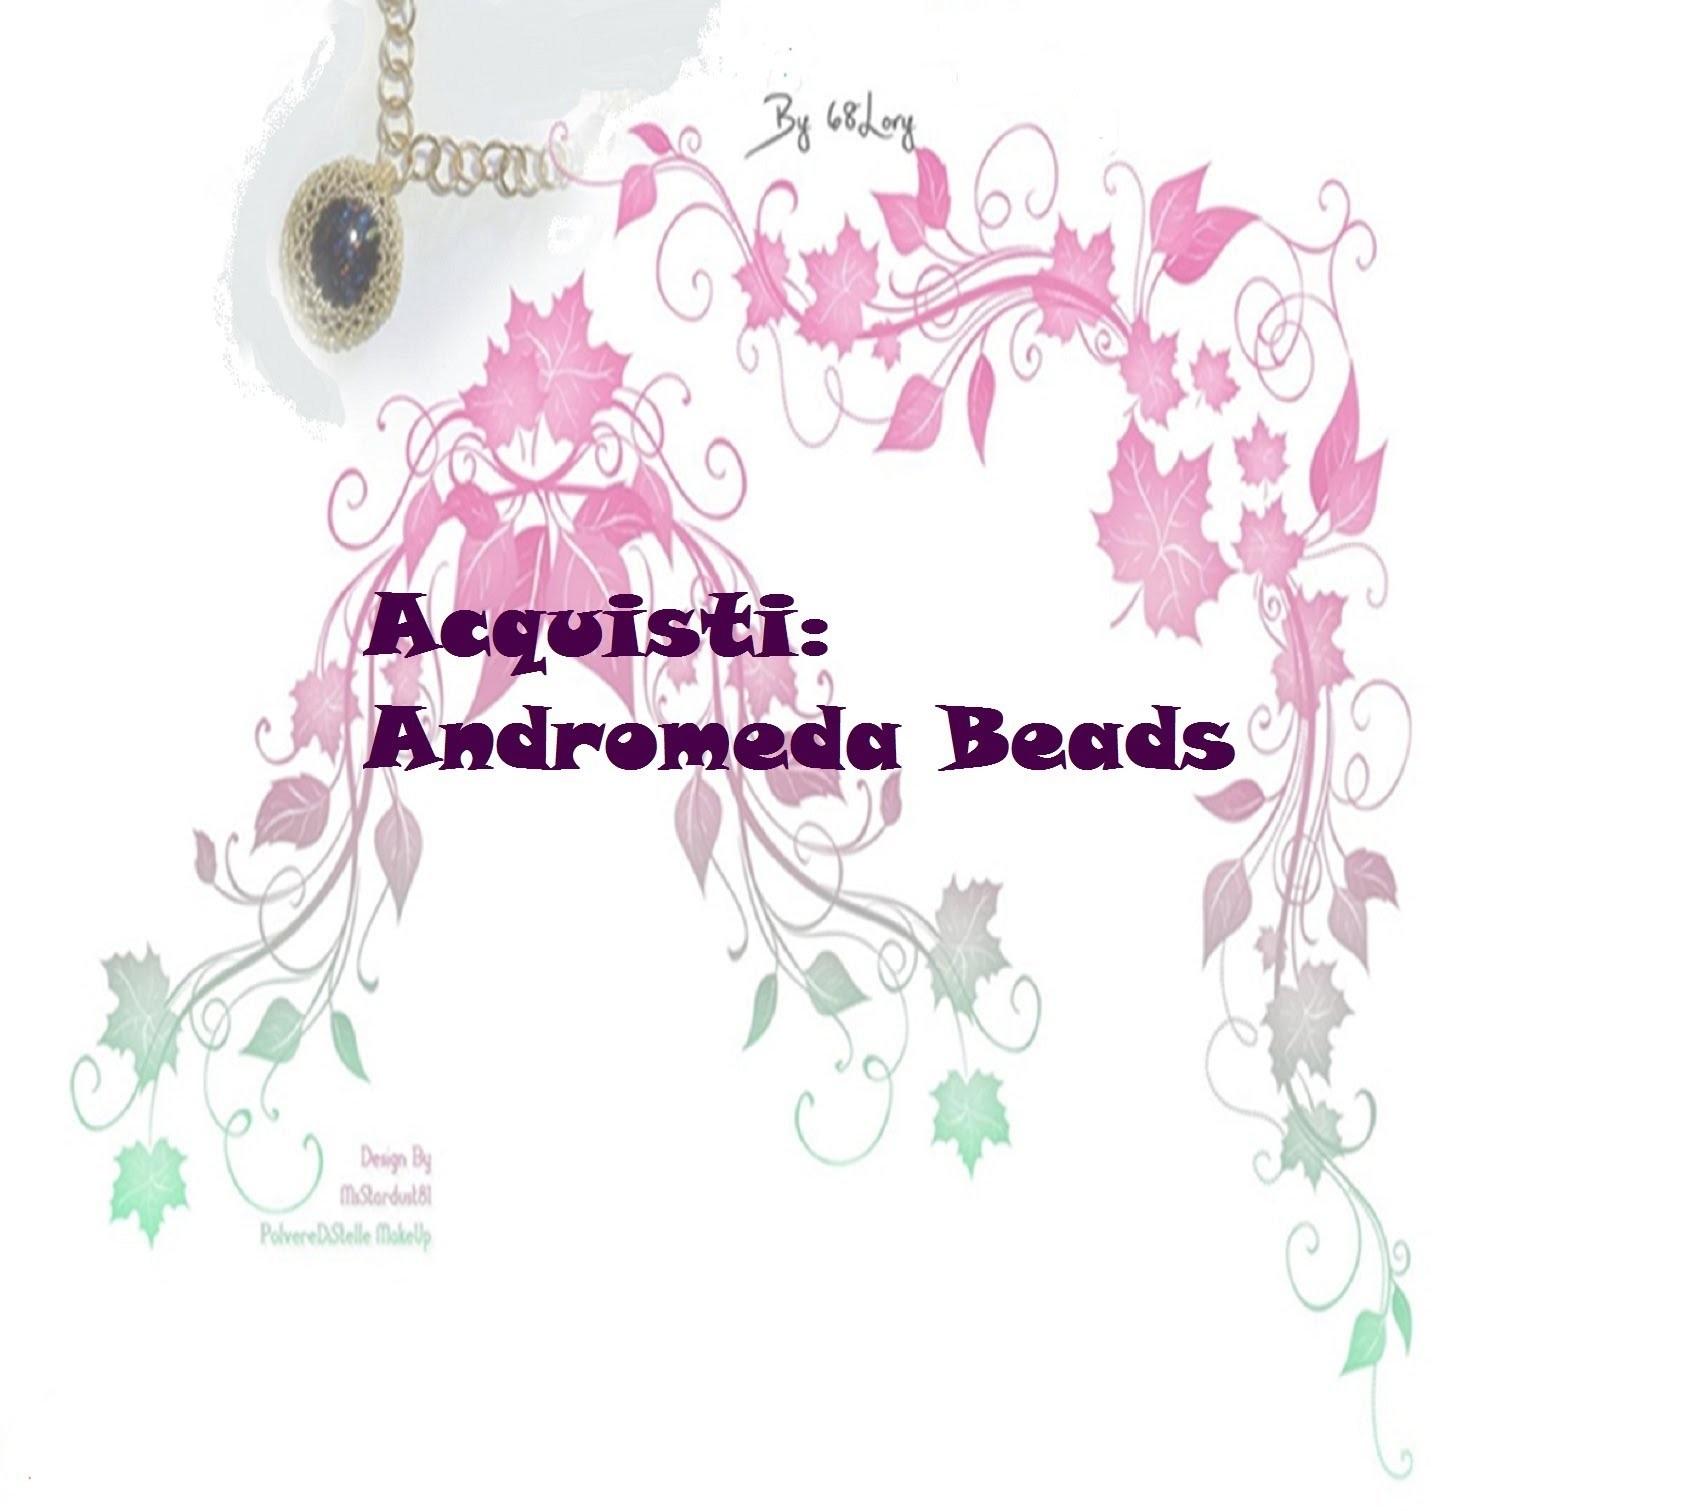 ACQUISTI: Andromeda Beads